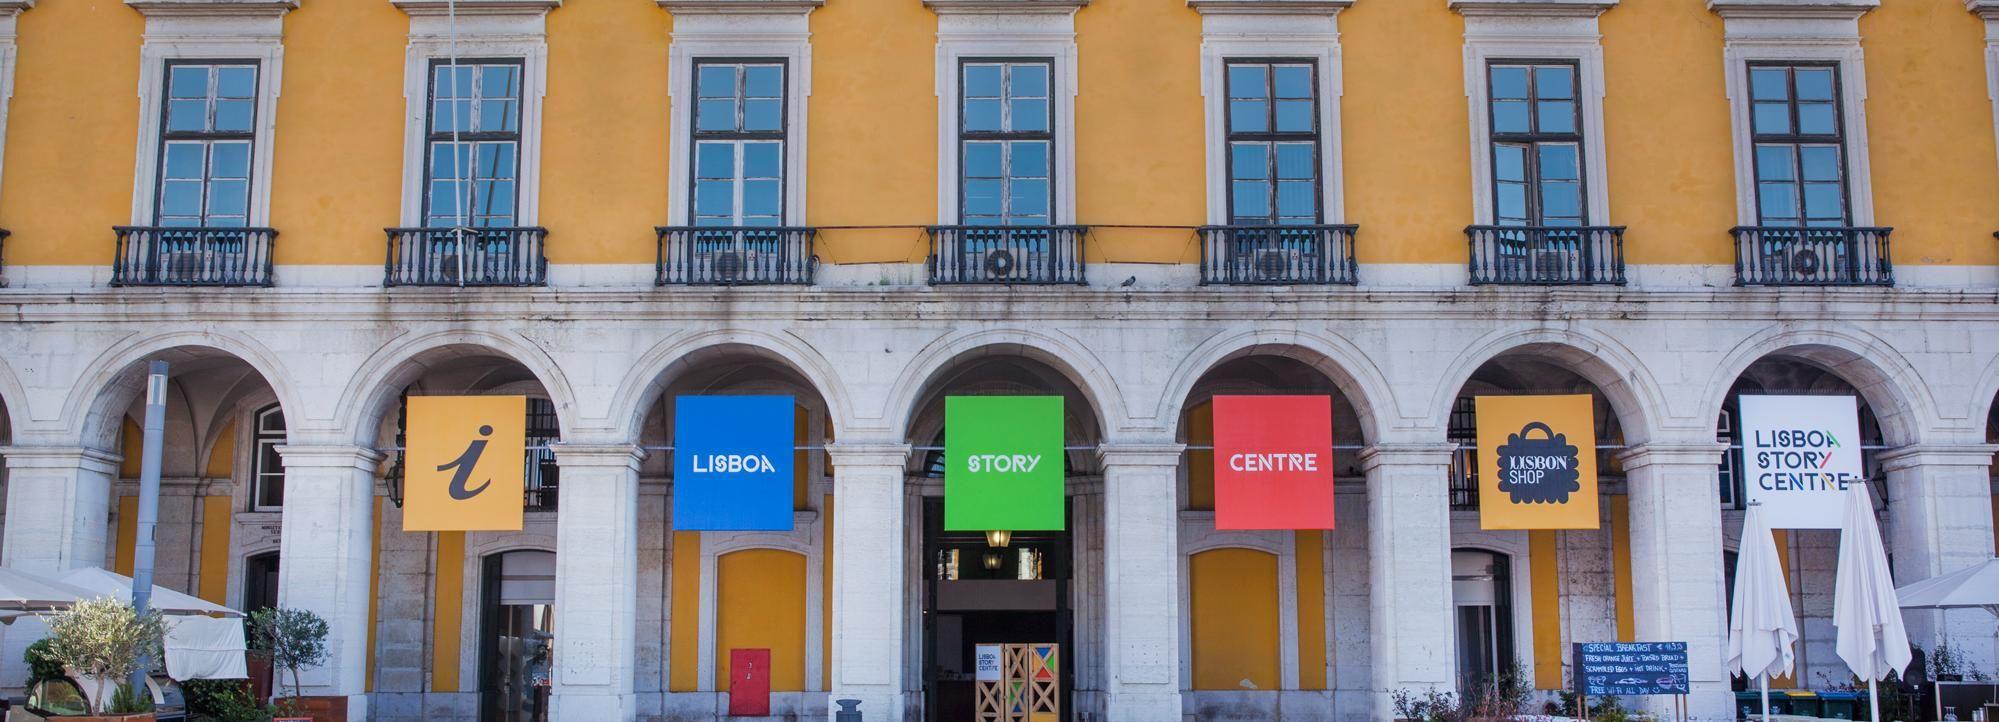 Tagesticket für das Lisboa Story Centre